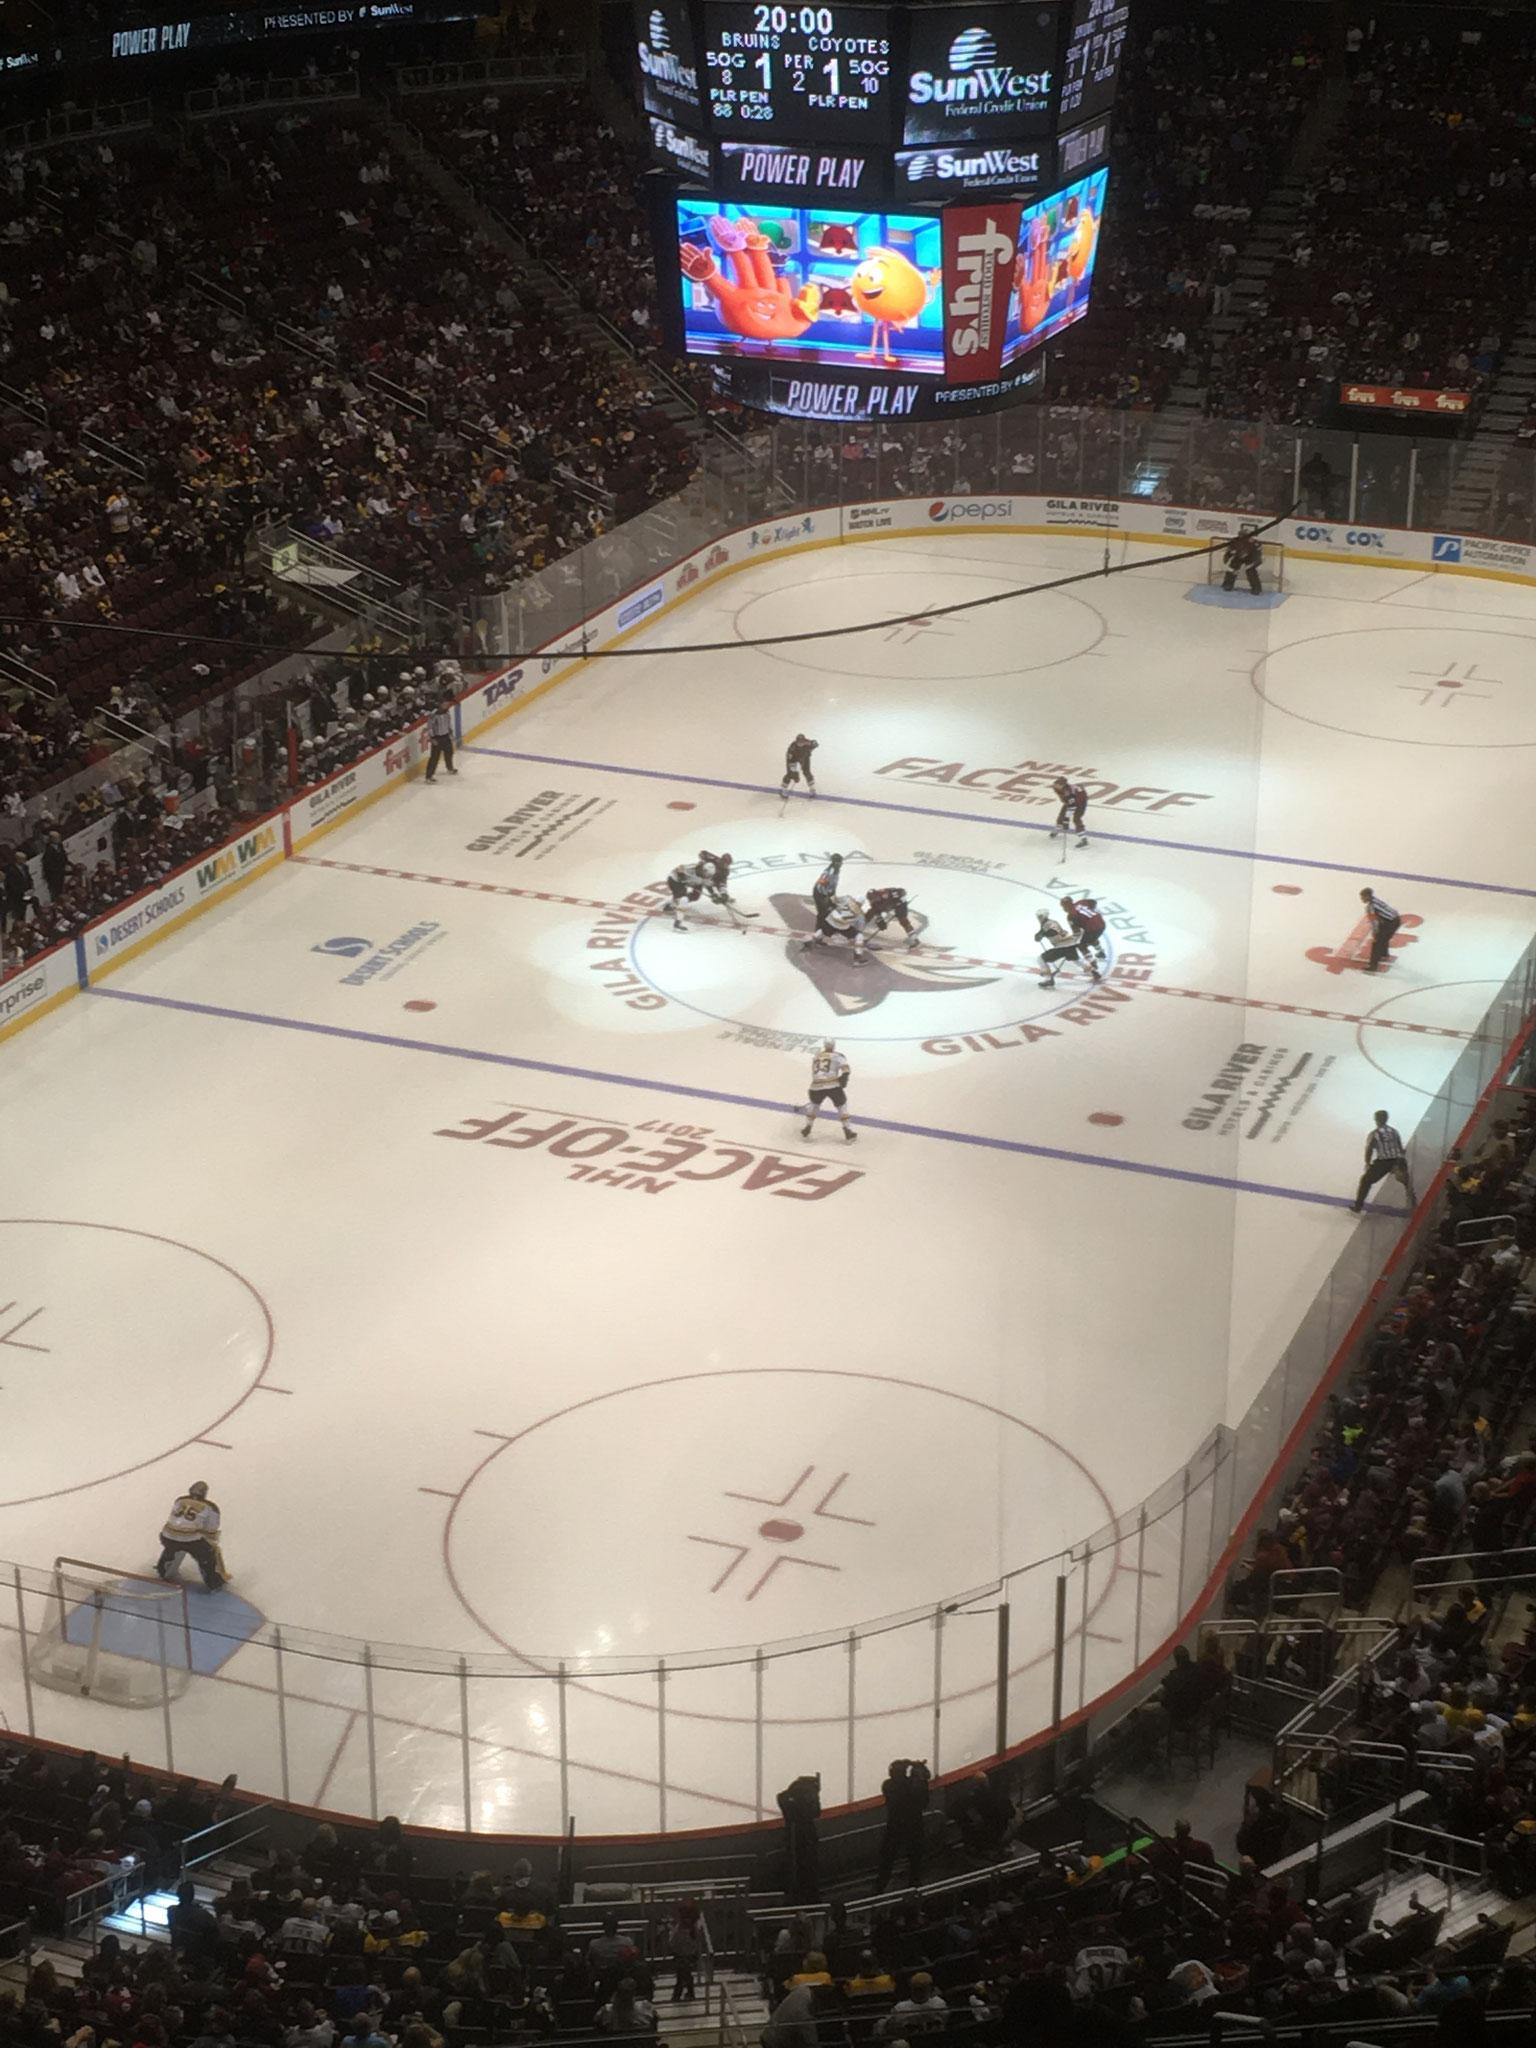 Arizona Coyotes vs Boston Bruins (2017/18)